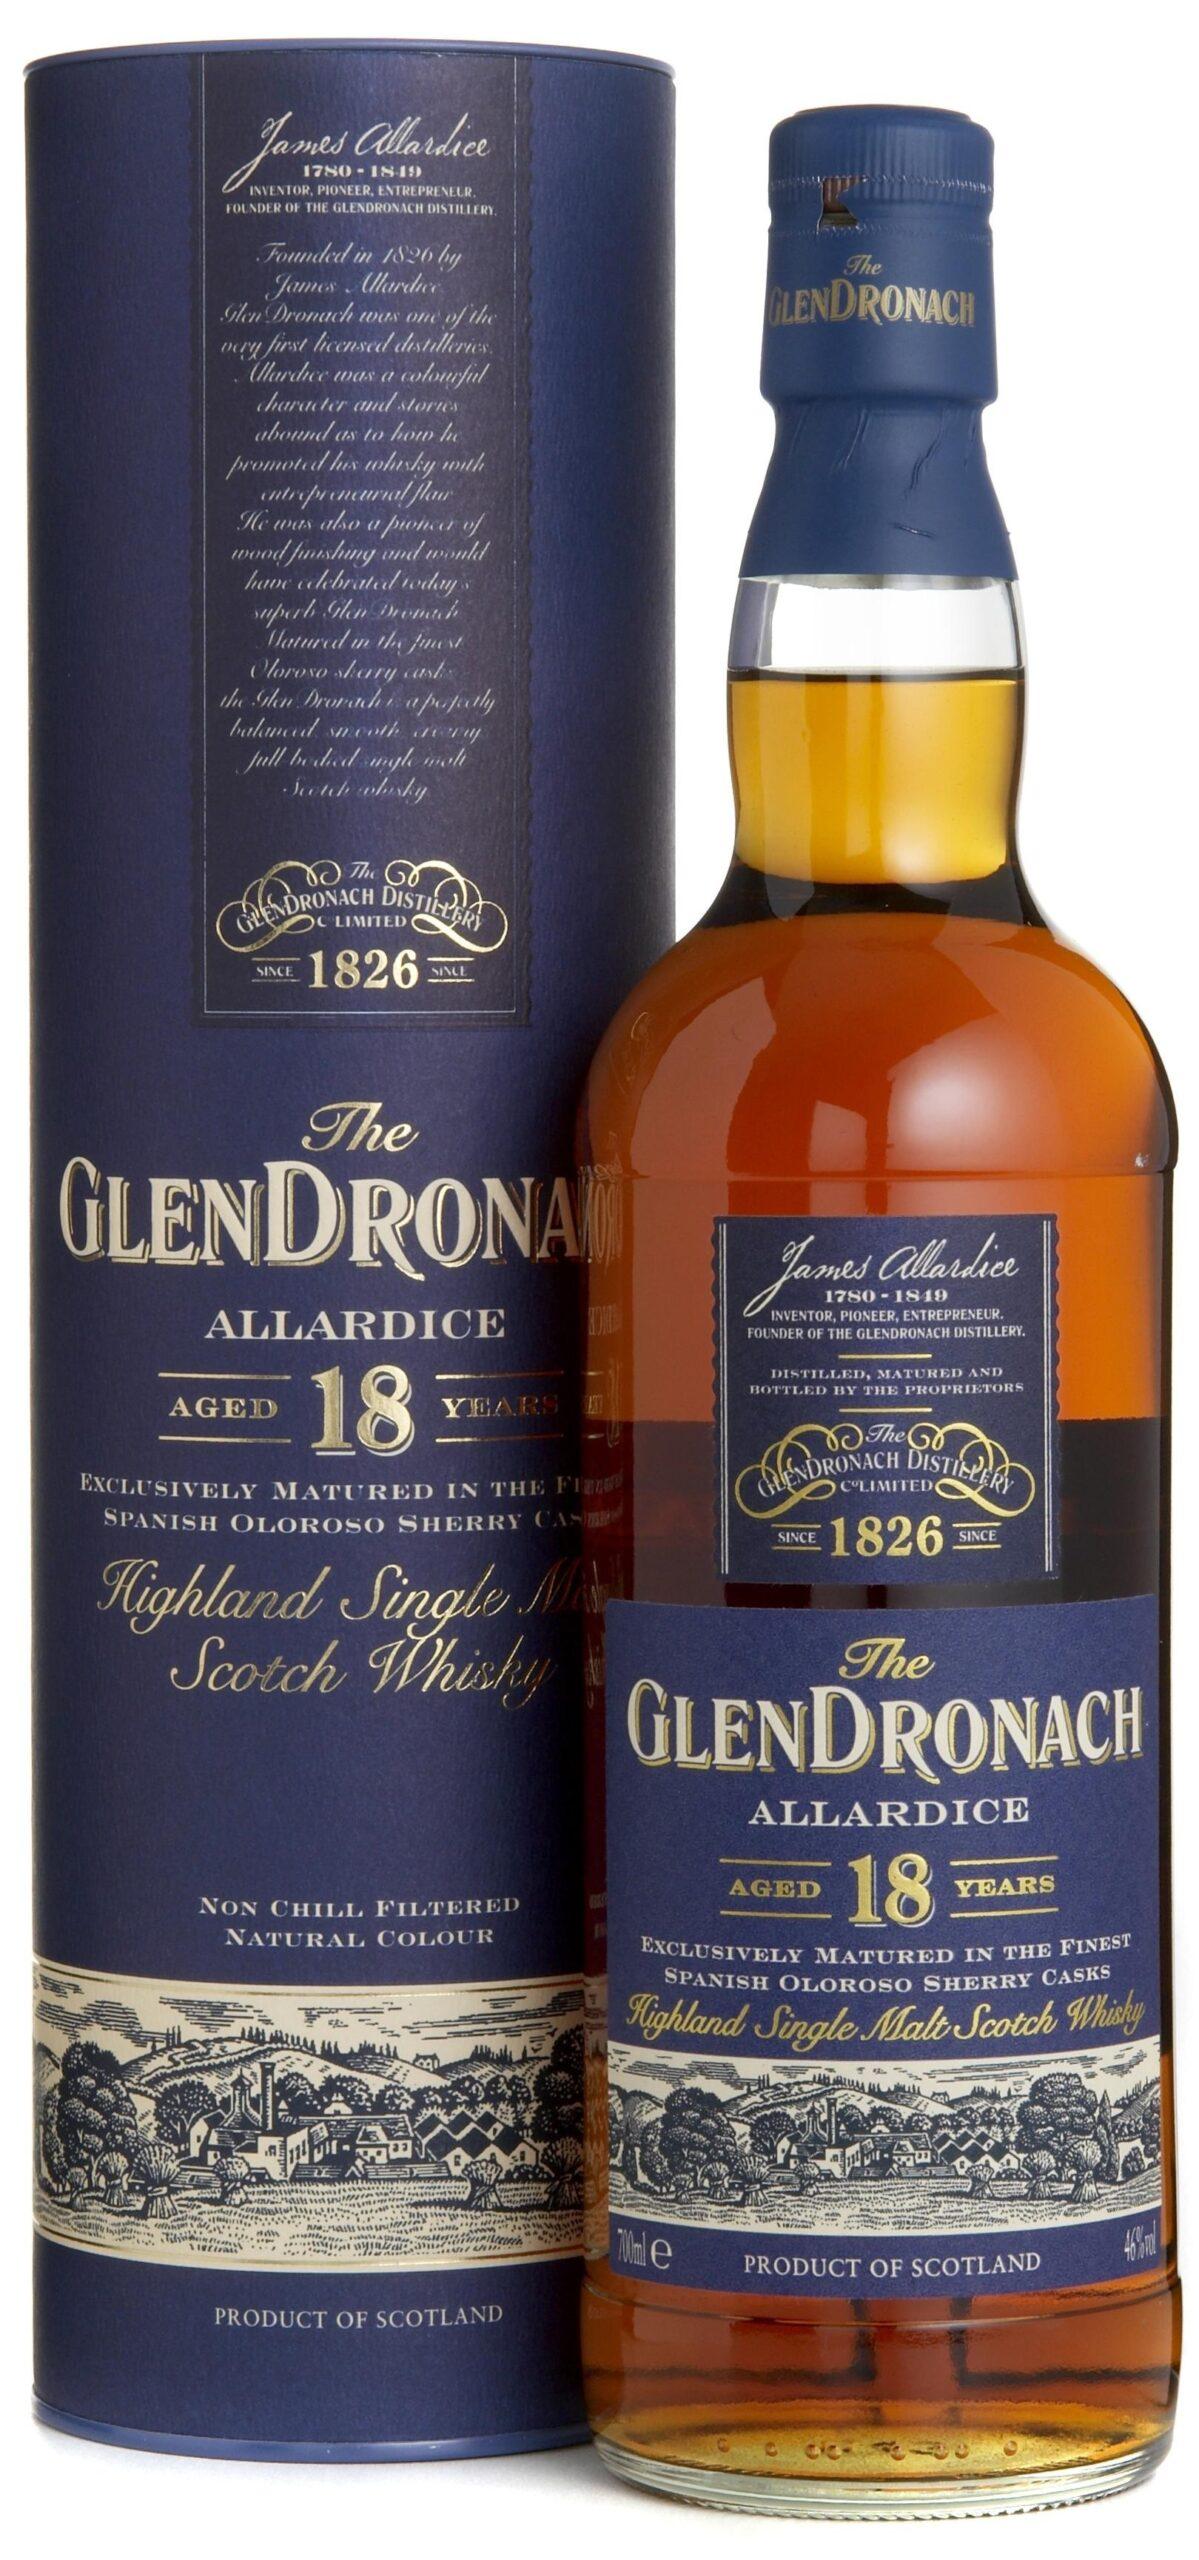 GlenDronach, Allardice, 18 Year